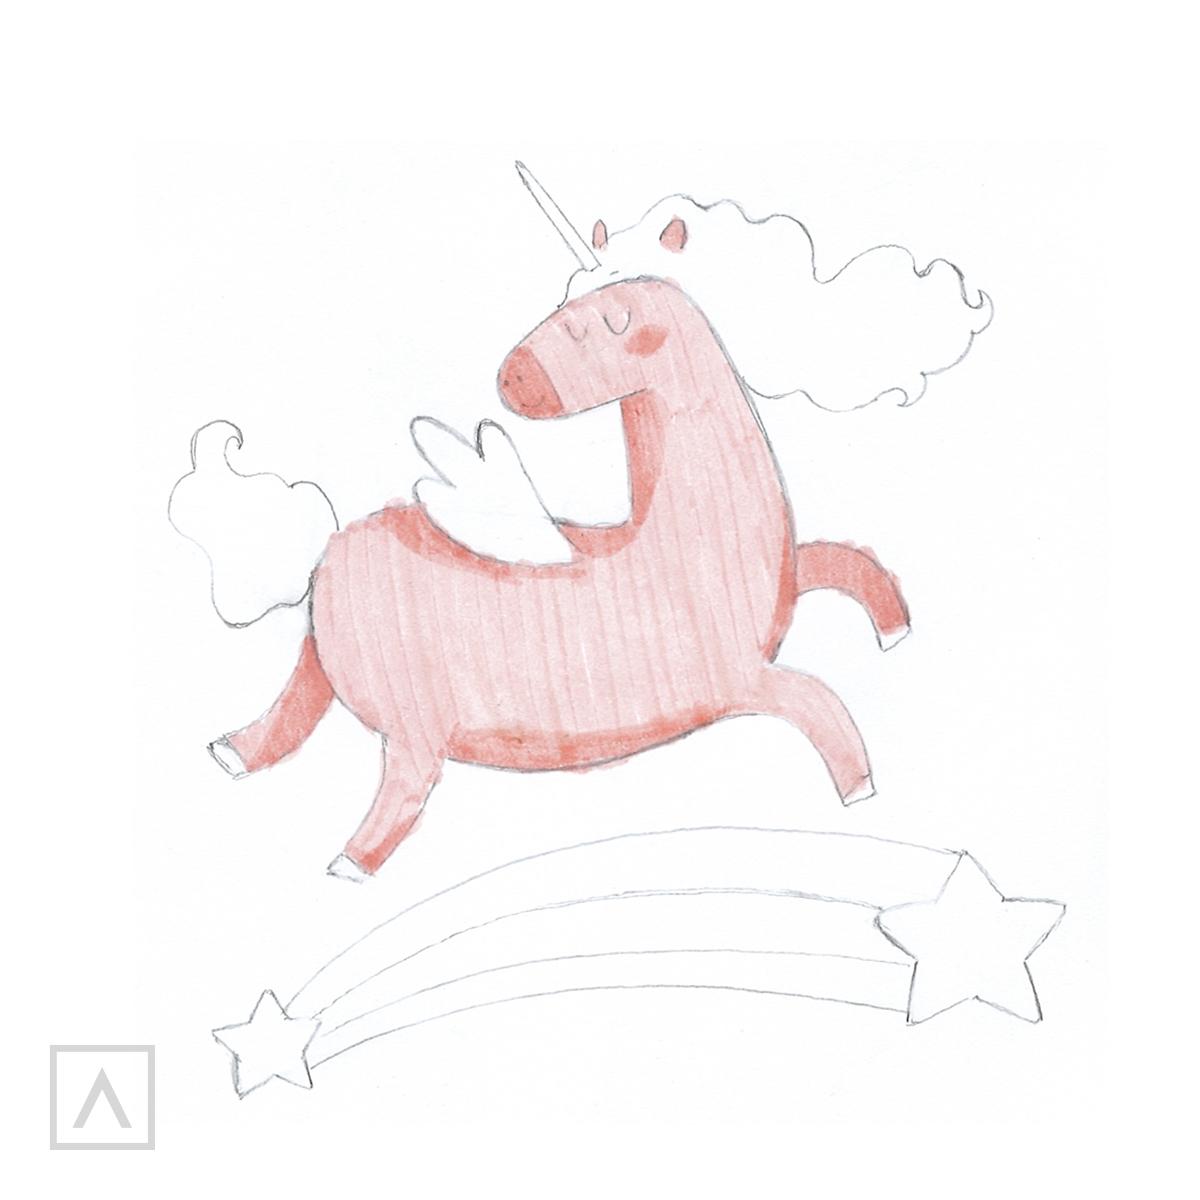 How to Draw a Unicorn - Step 6